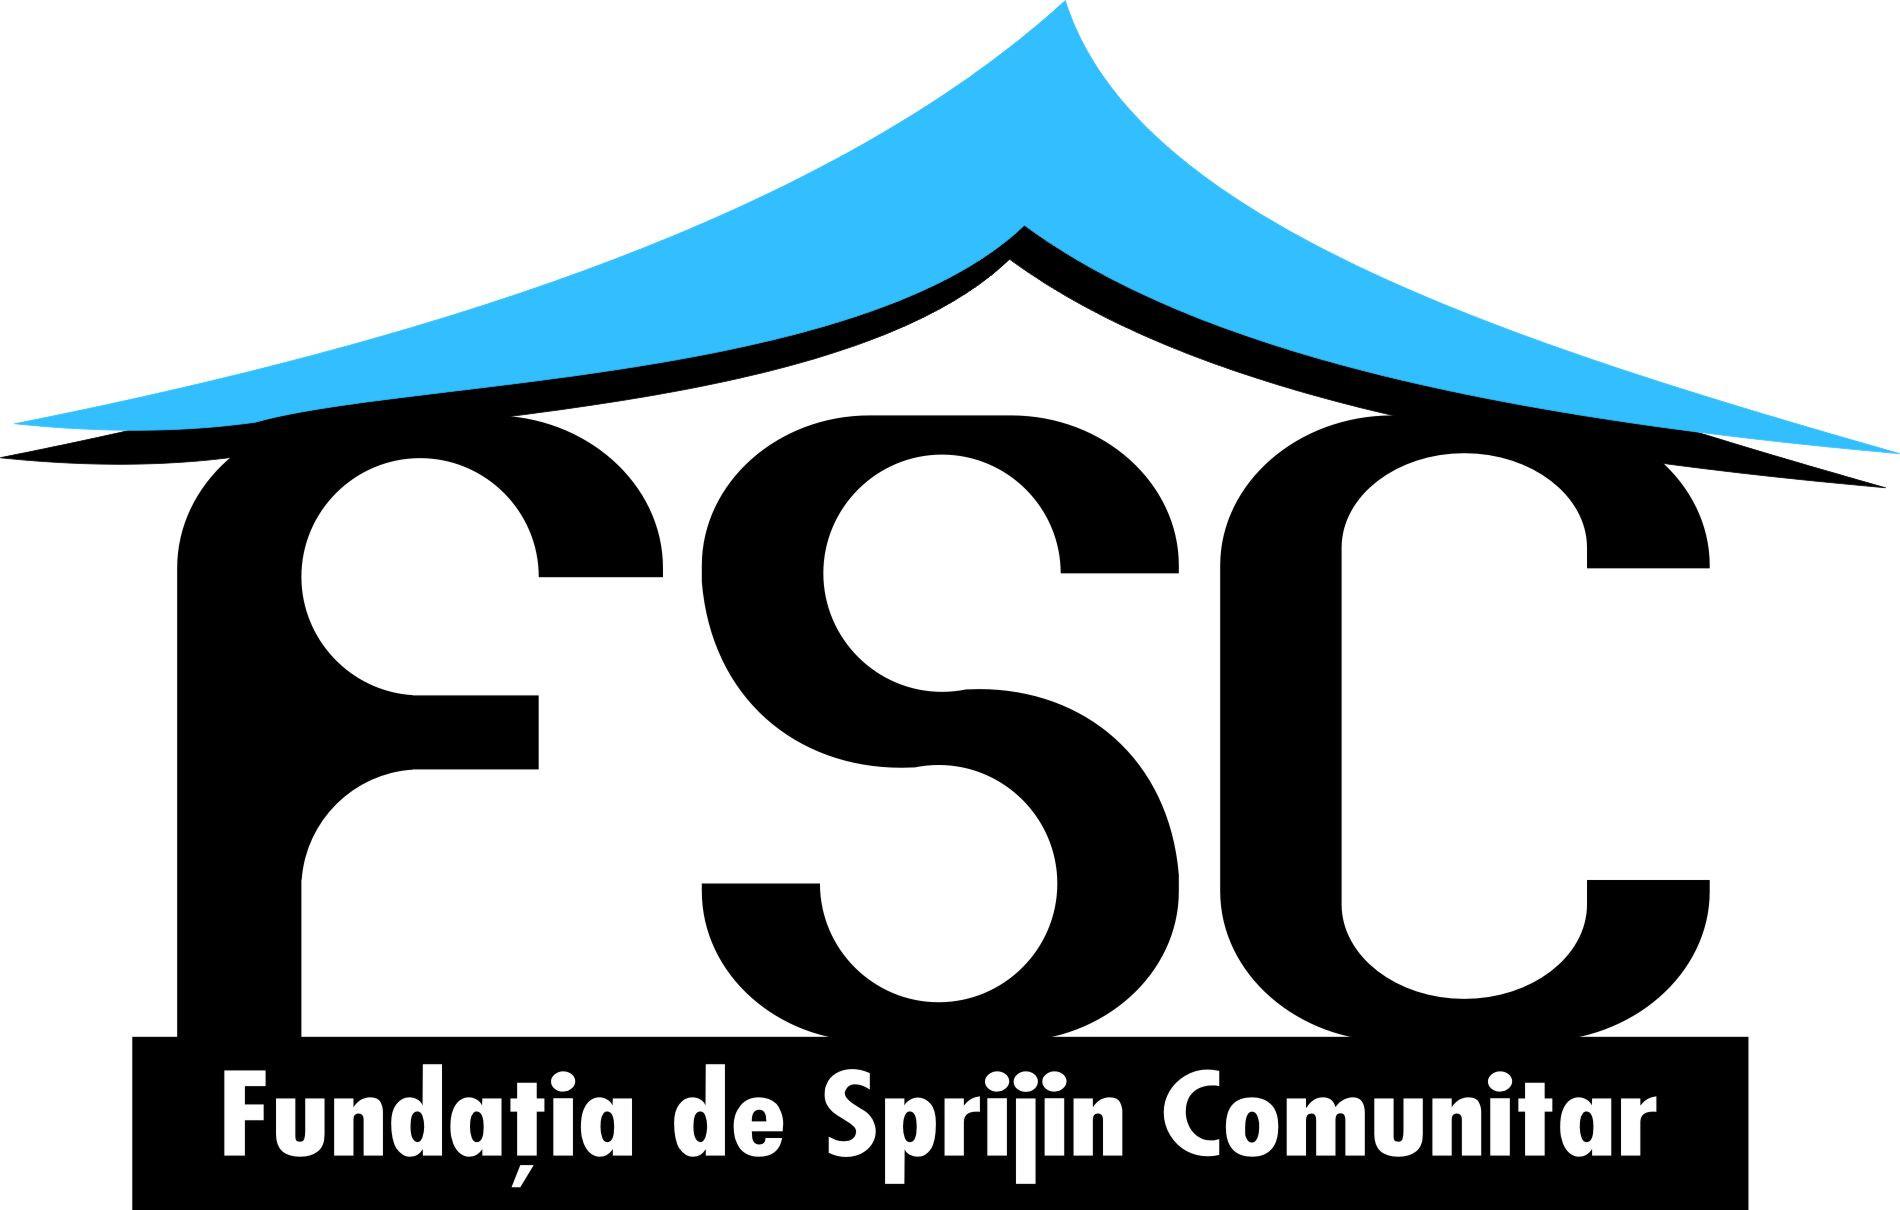 Fundatia de Sprijin Comunitar logo